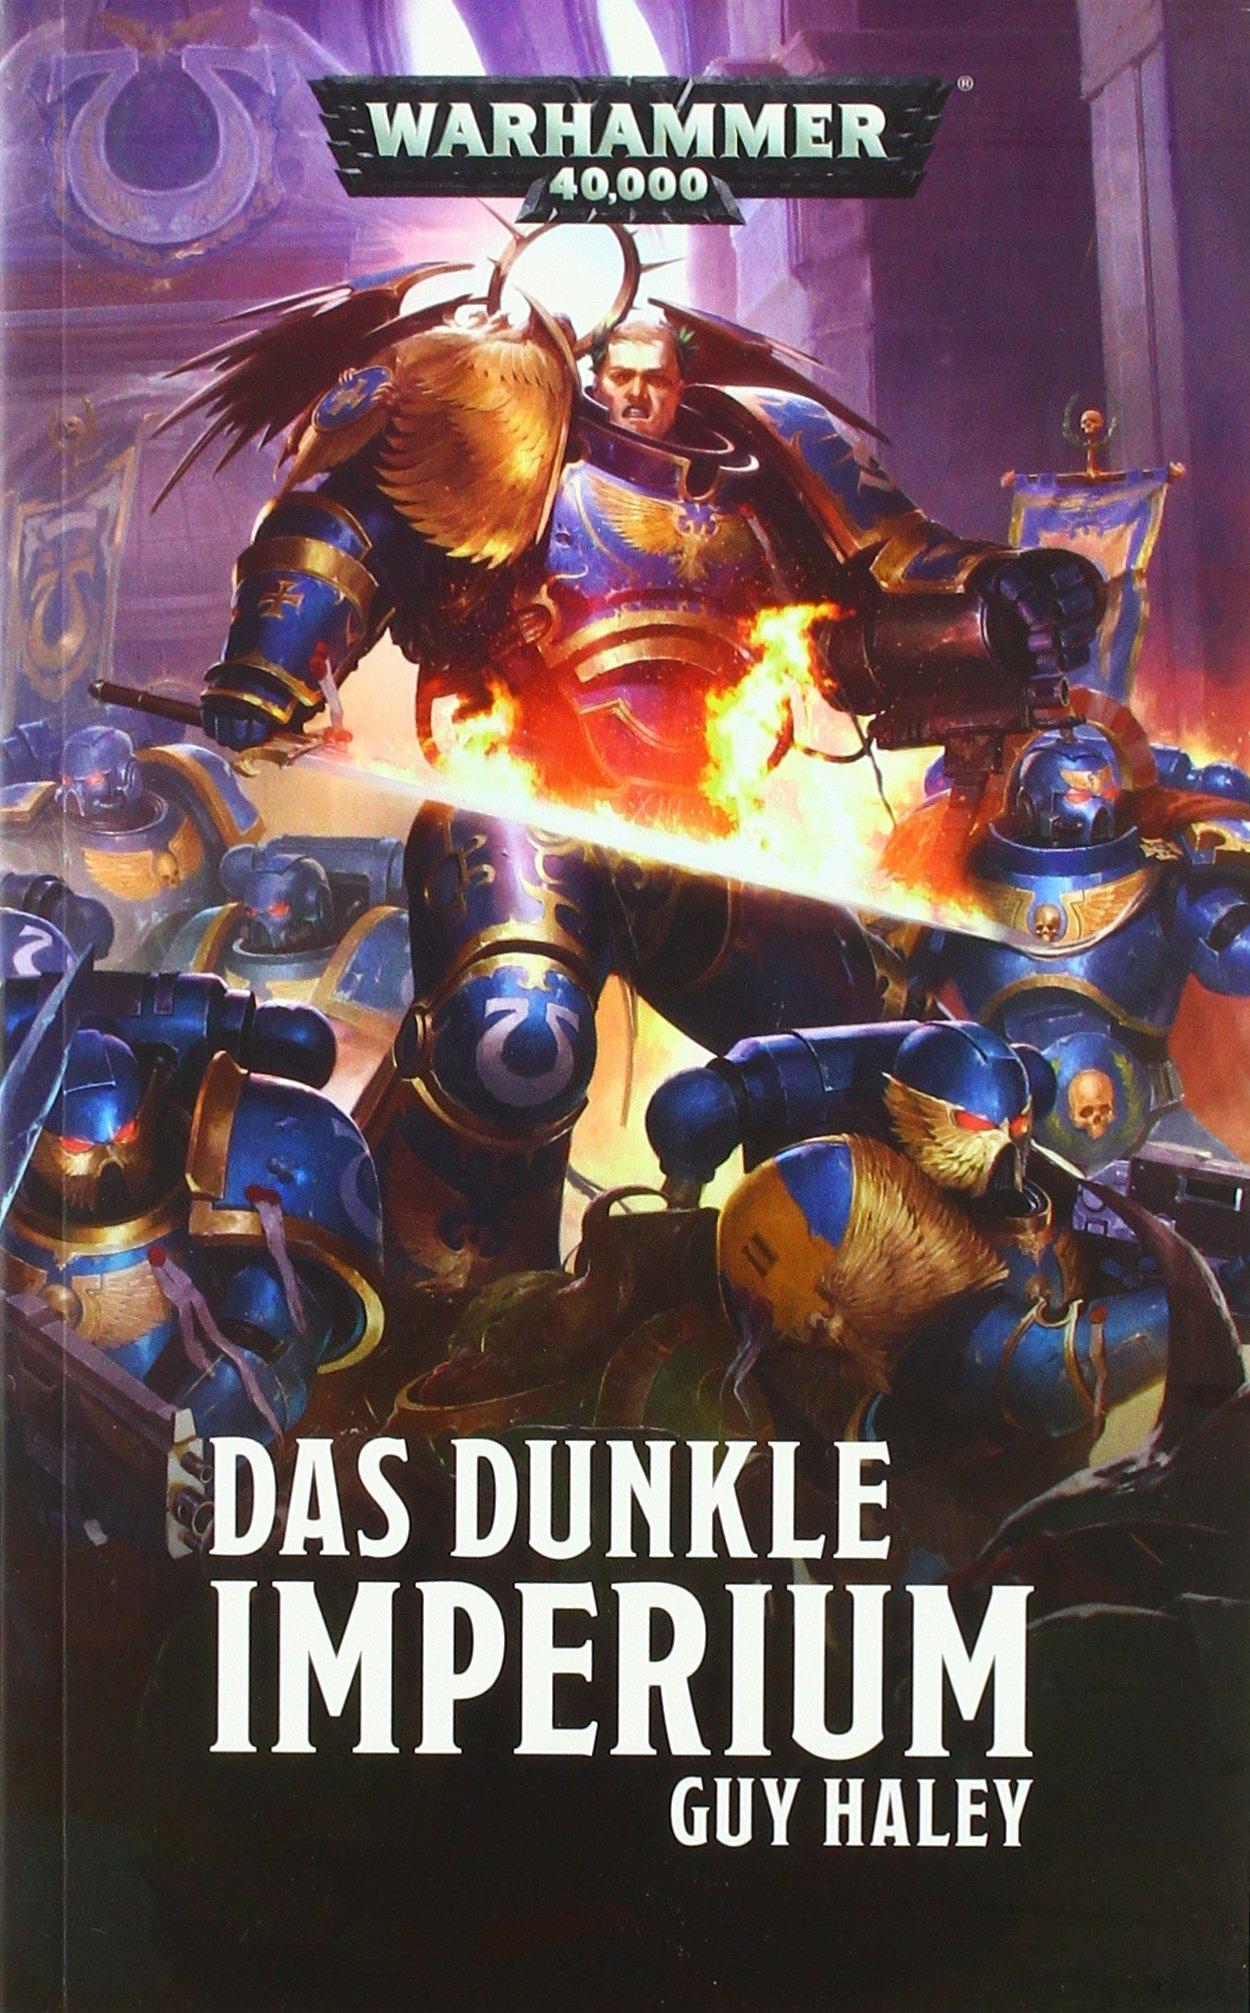 Warhammer 40.000 - Das dunkle Imperium Broschiert – 4. April 2018 Guy Haley Black Library 1781932646 Science Fiction